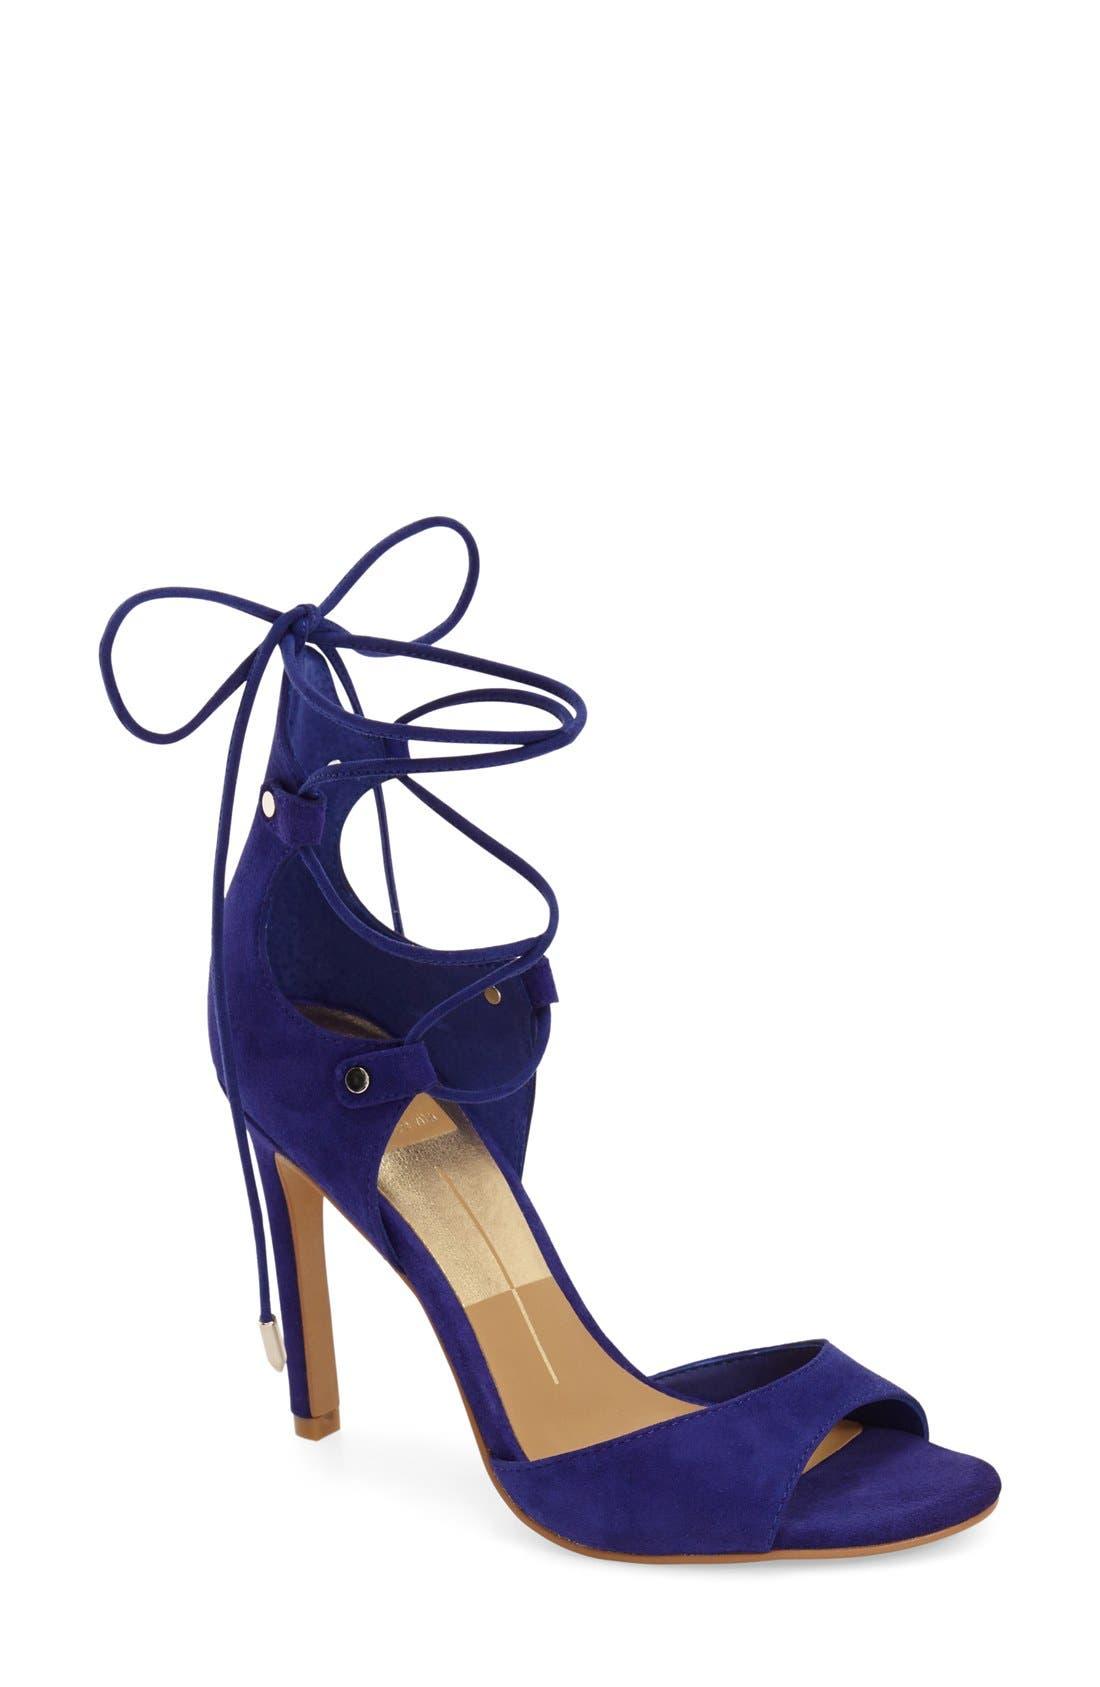 'Hazely' Lace-Up Sandal,                         Main,                         color, Blue Suede